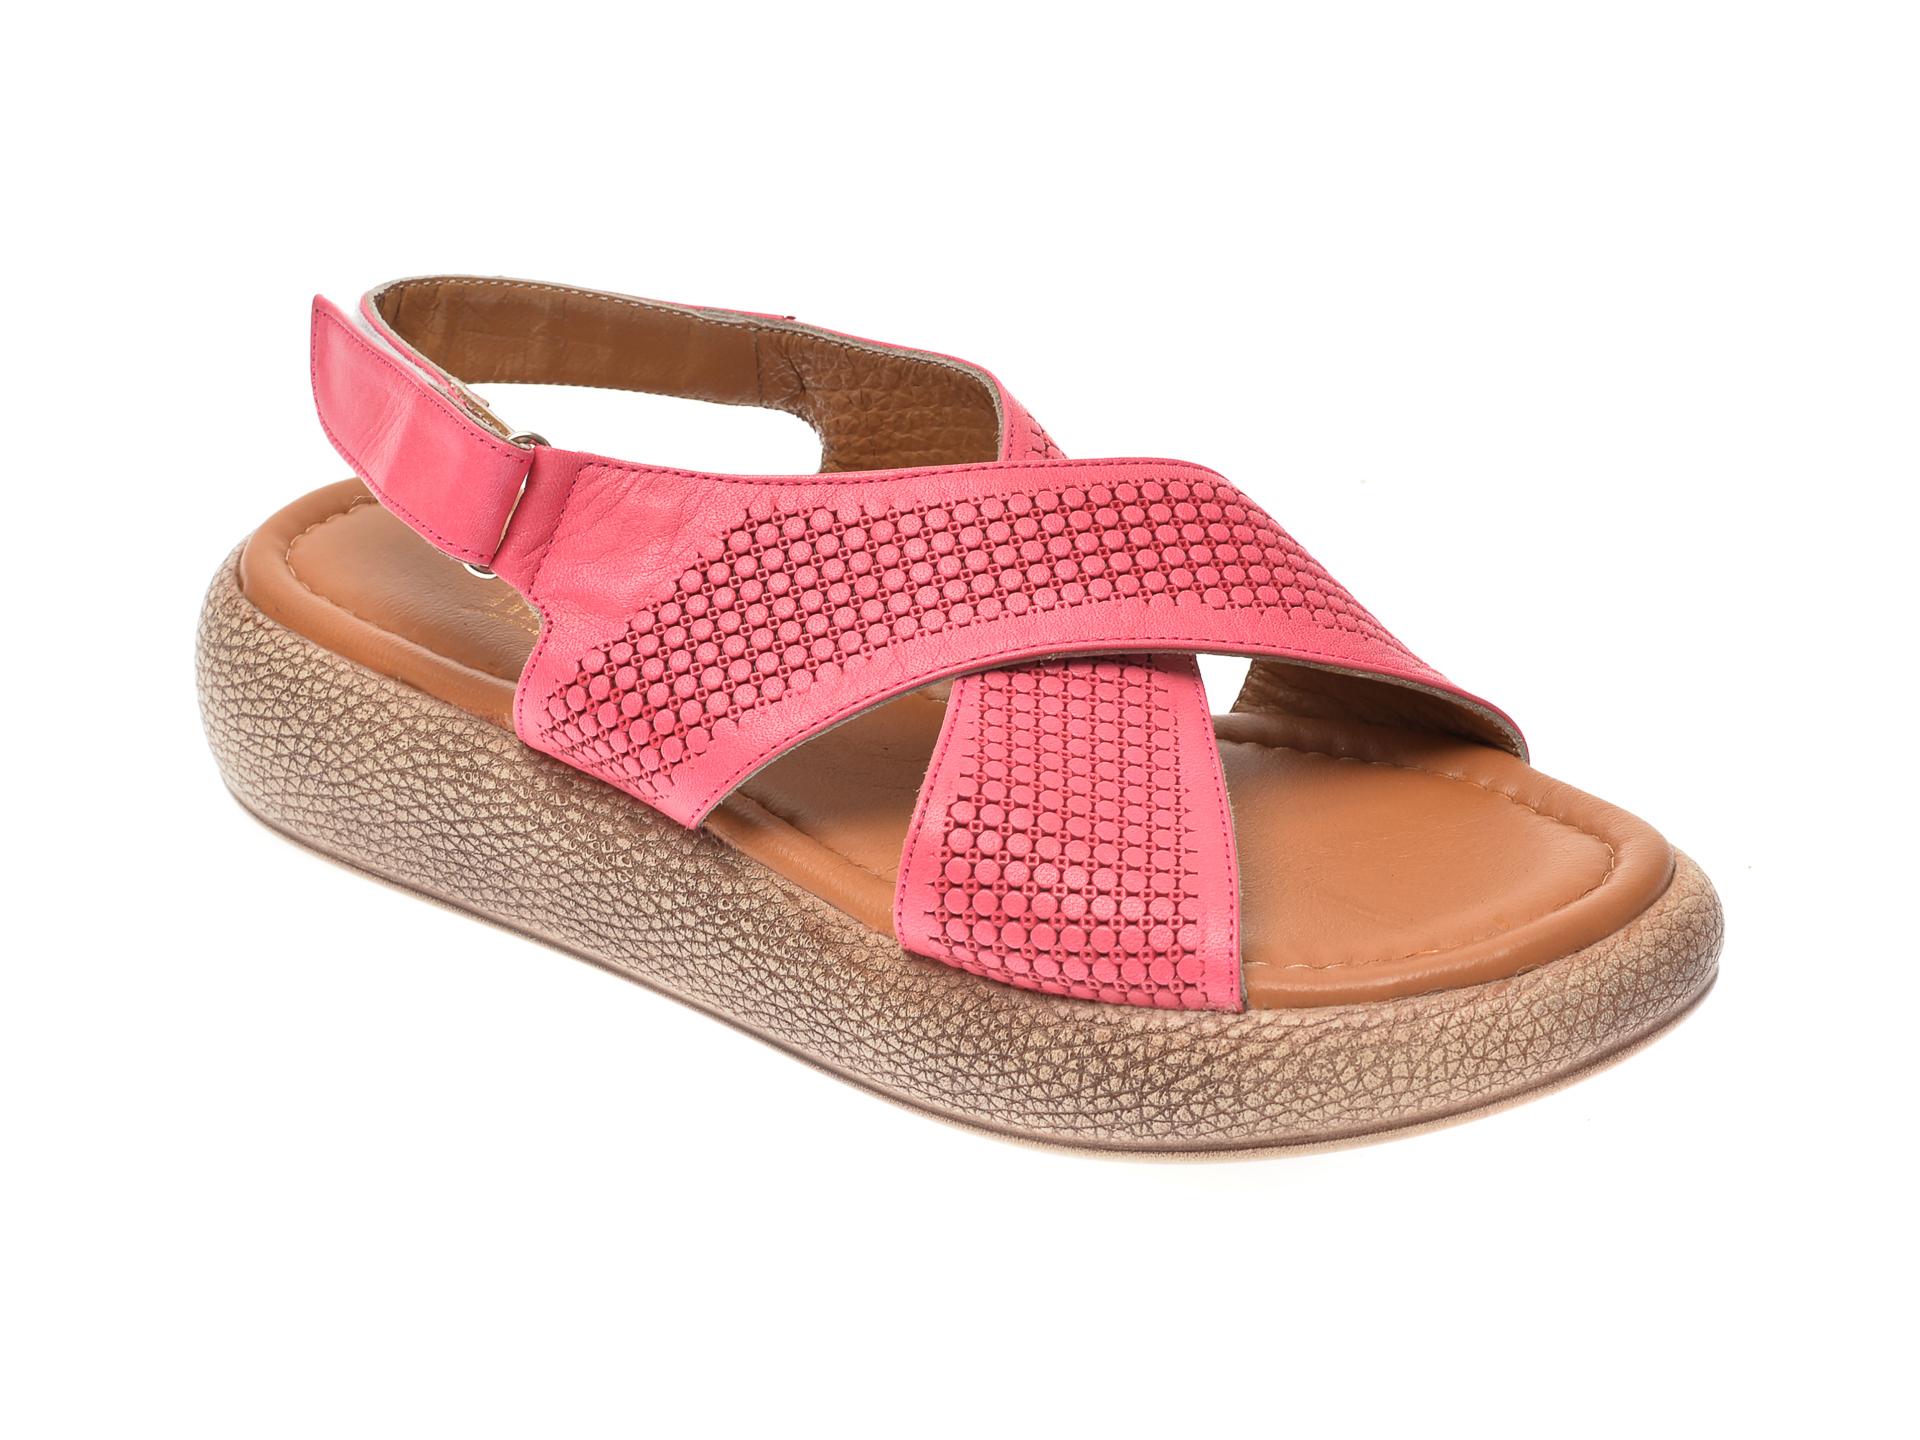 Sandale IMAGE roz, 6025, din piele naturala imagine